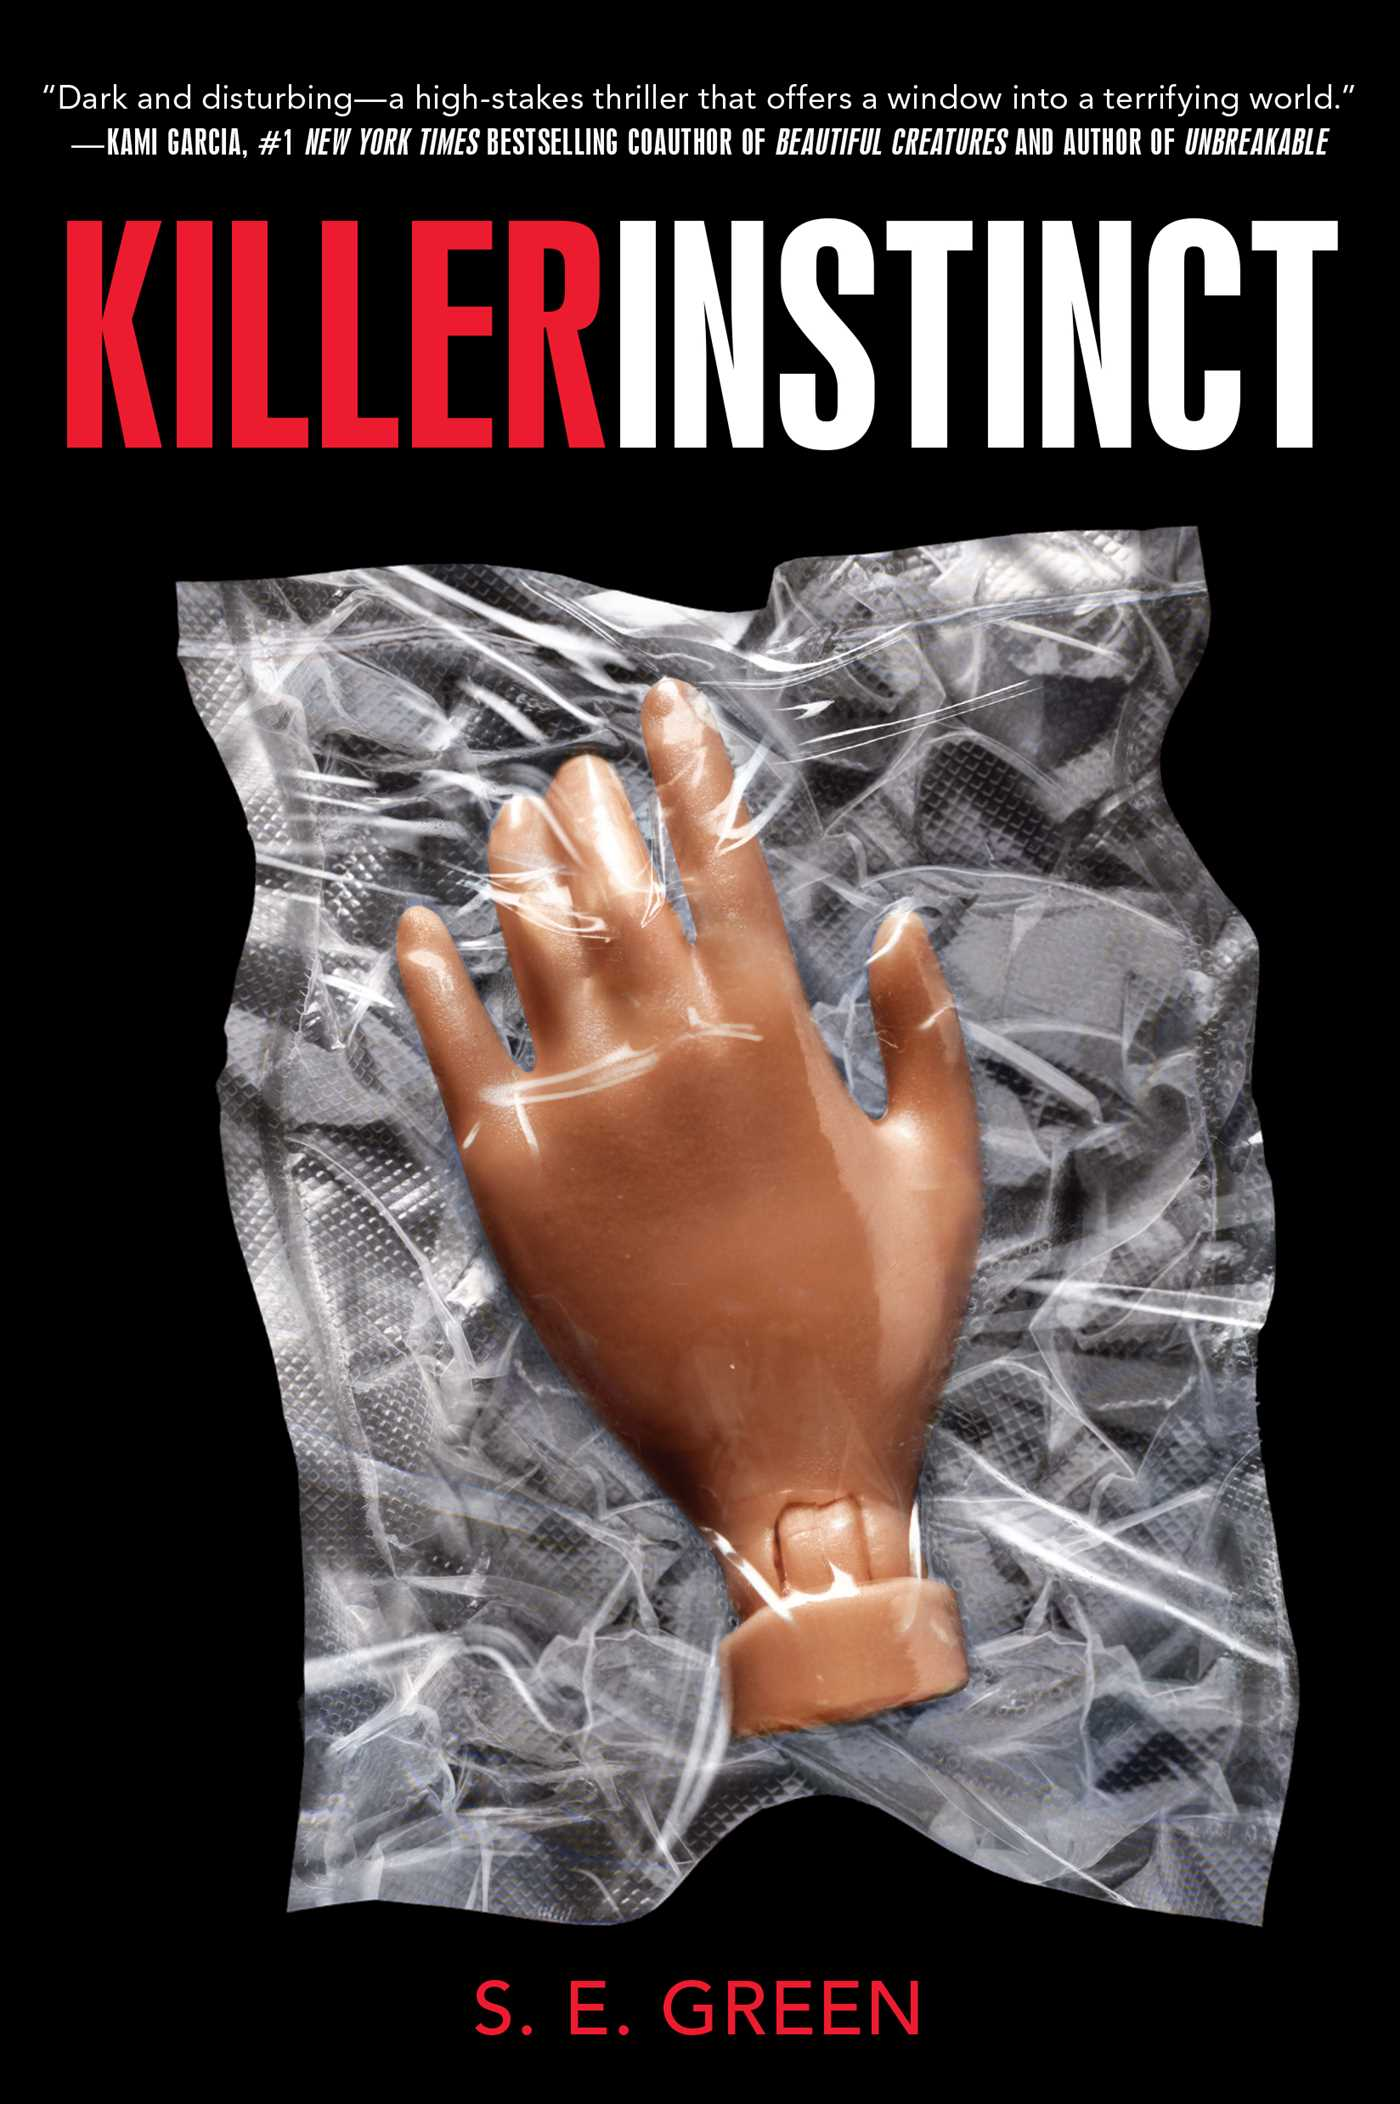 Killer Instinct   Book by S E  Green   Official Publisher